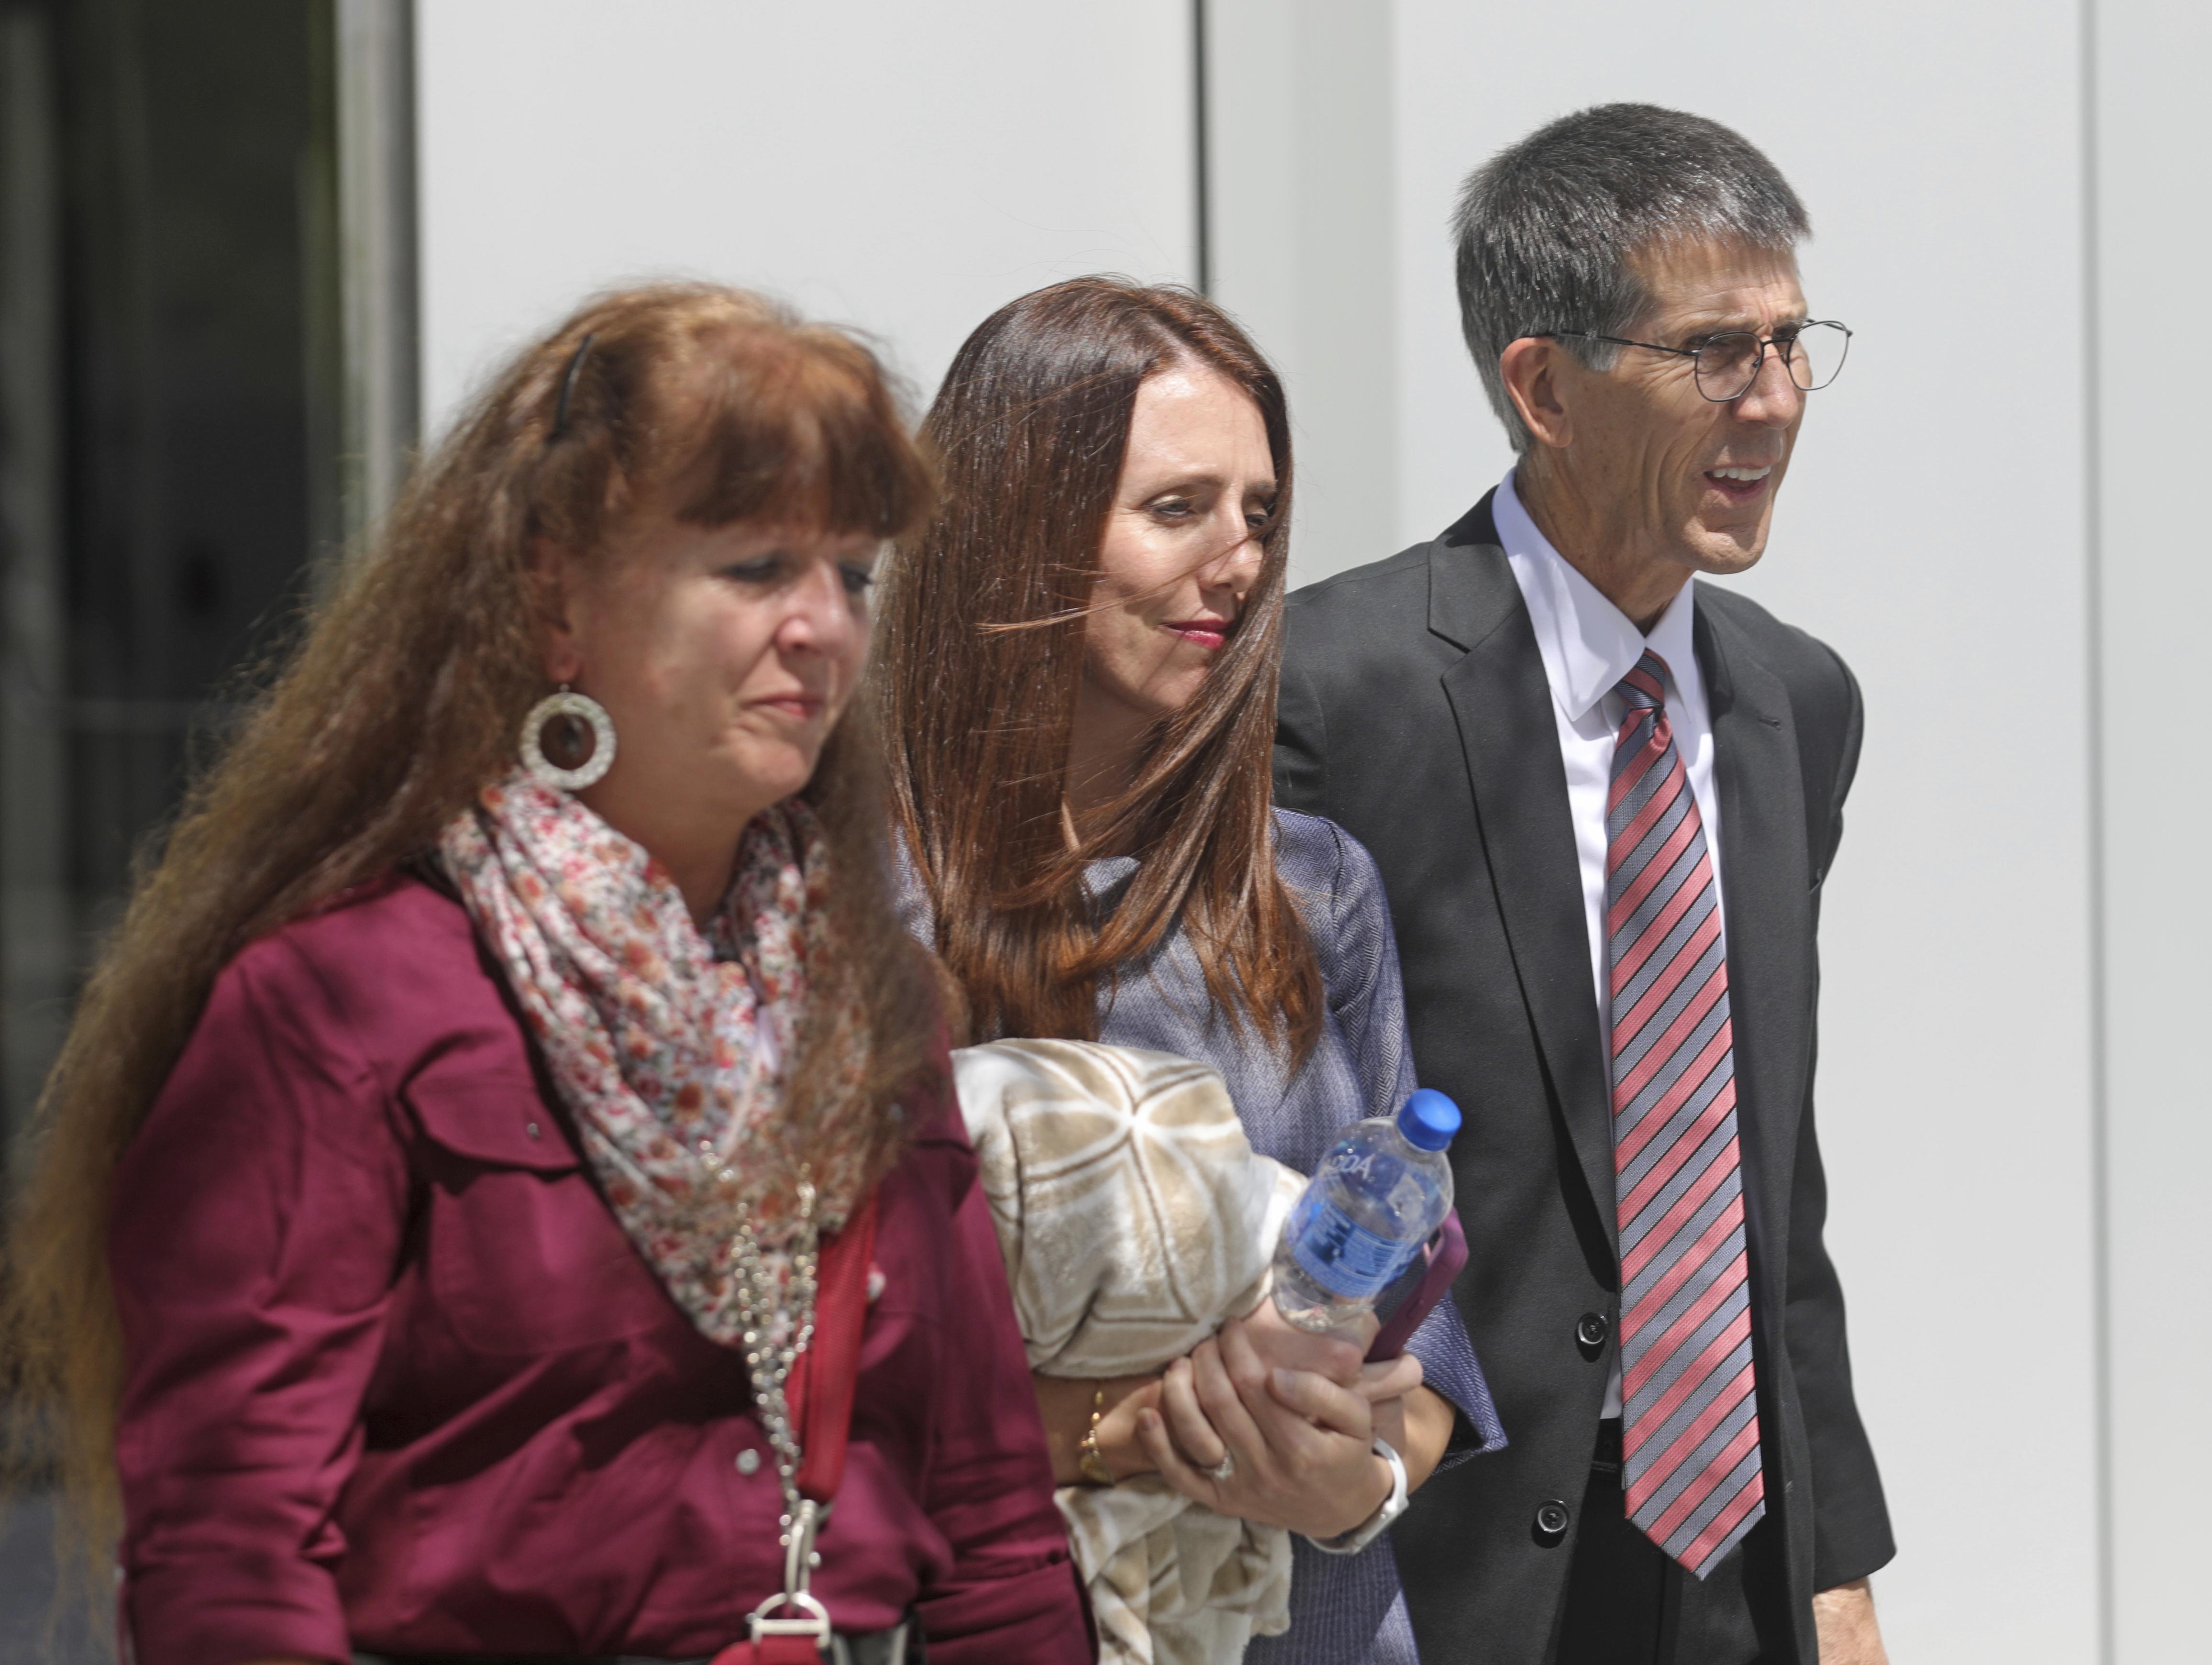 Jury deliberating in Utah case involving major opioid ring